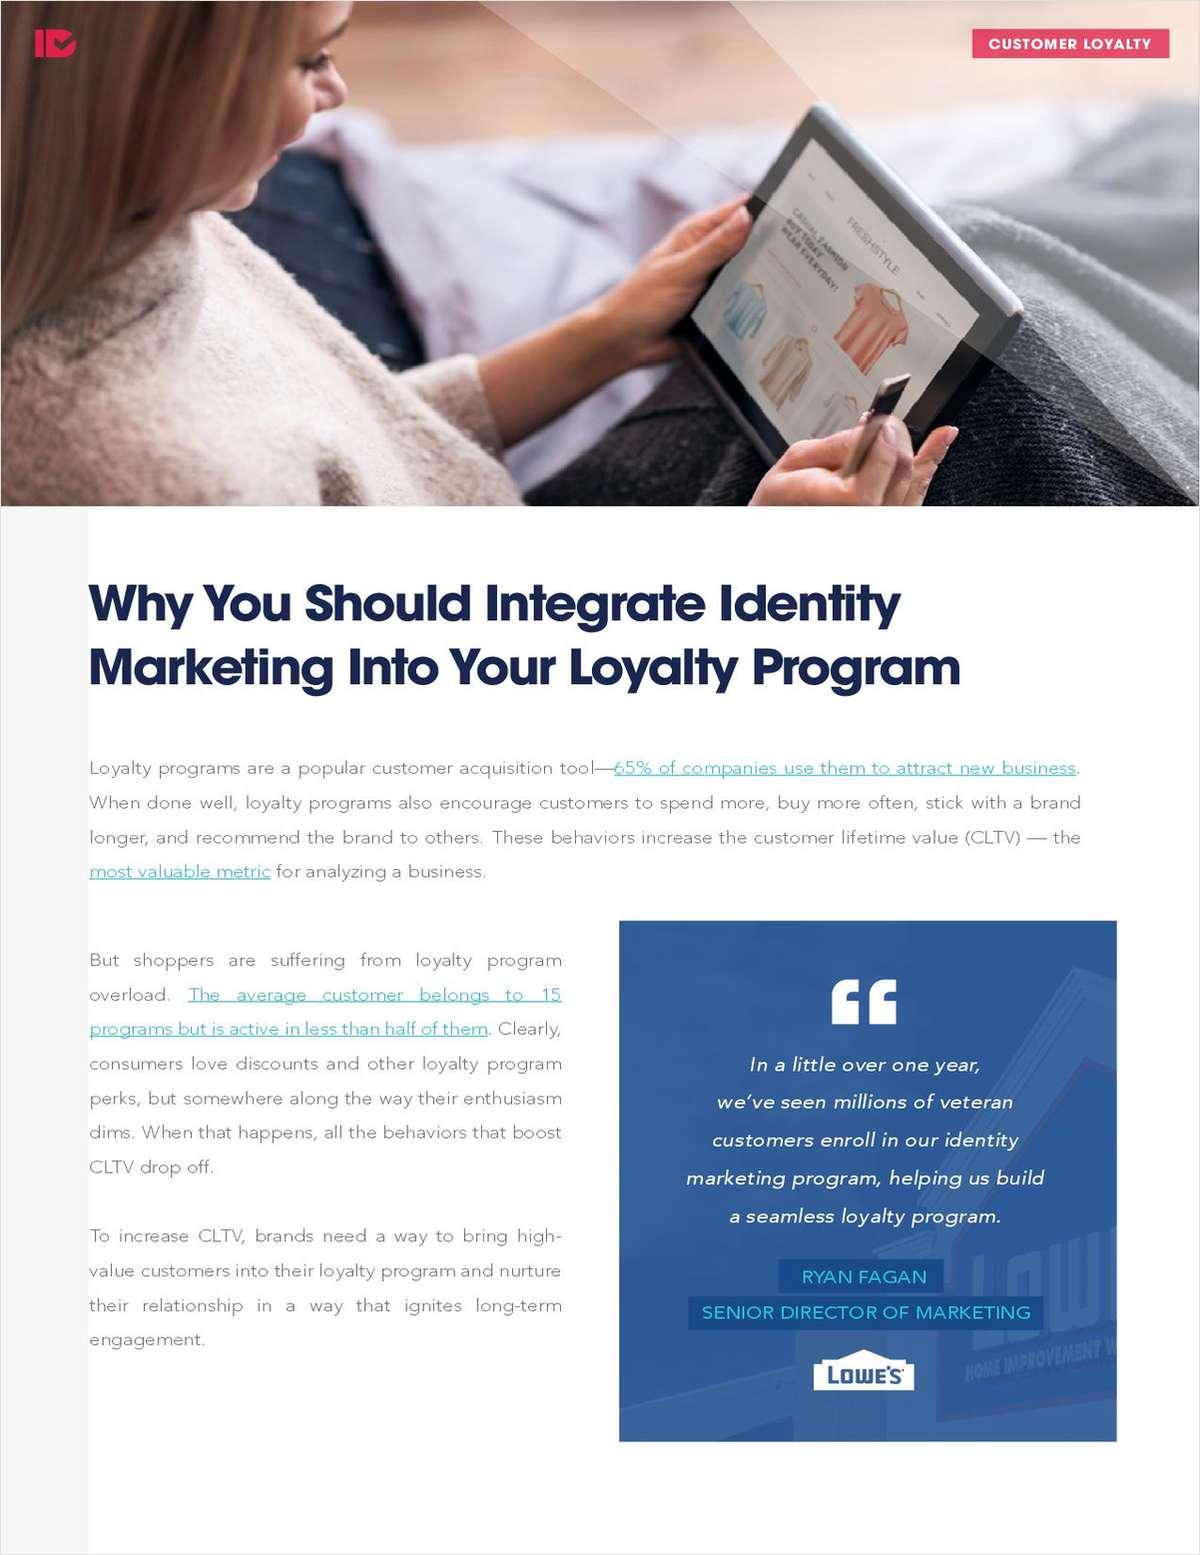 7 Ways Identity Marketing Increases Customer Loyalty